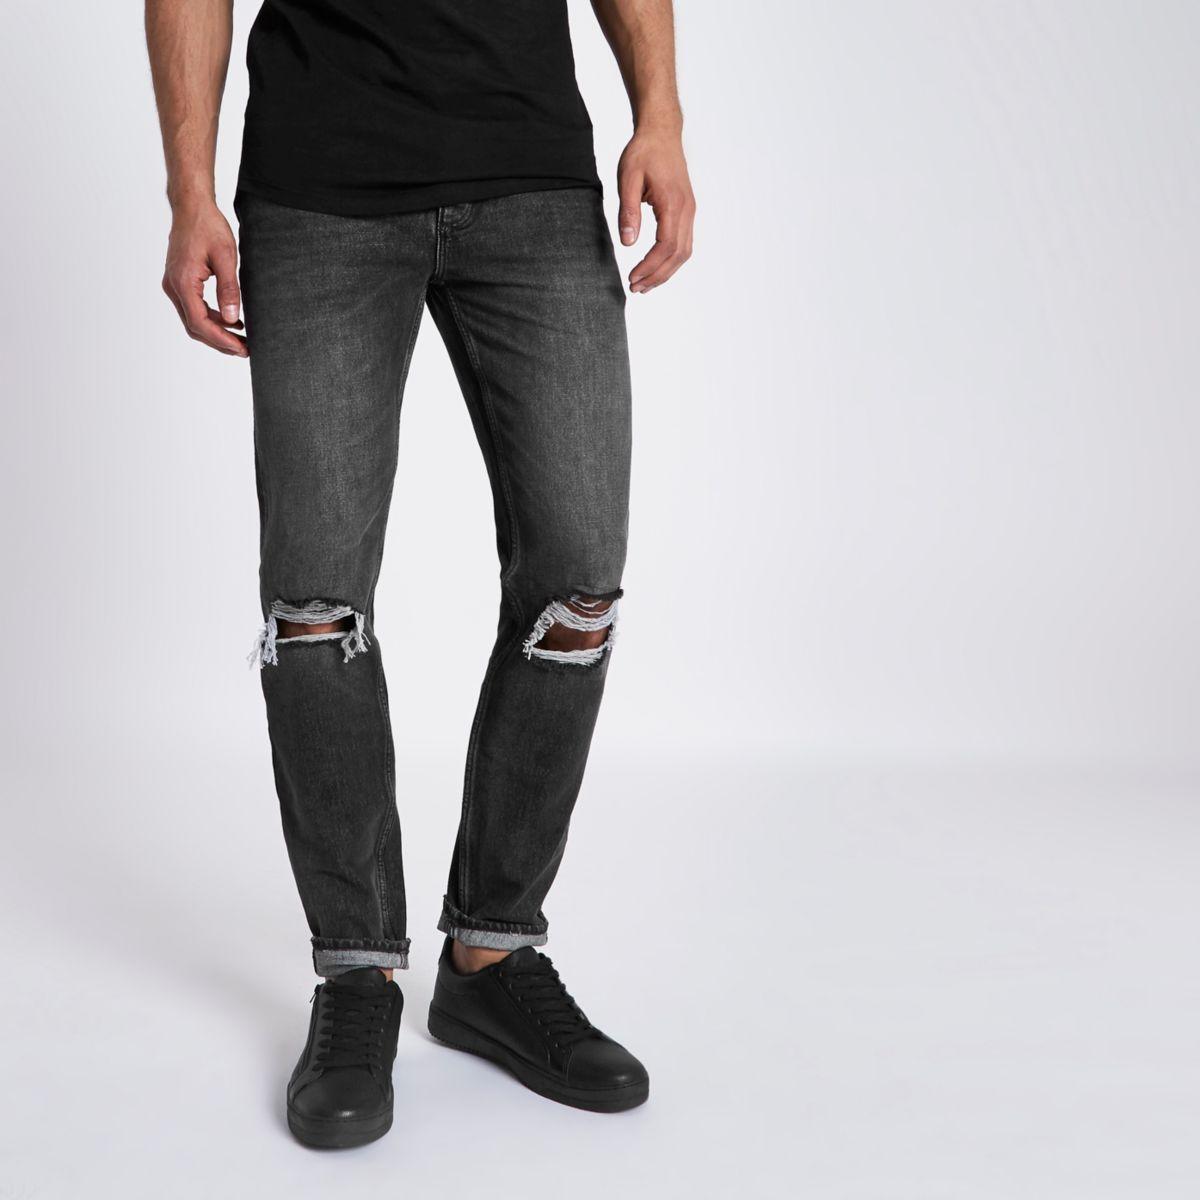 Black warp distressed stretch skinny jeans